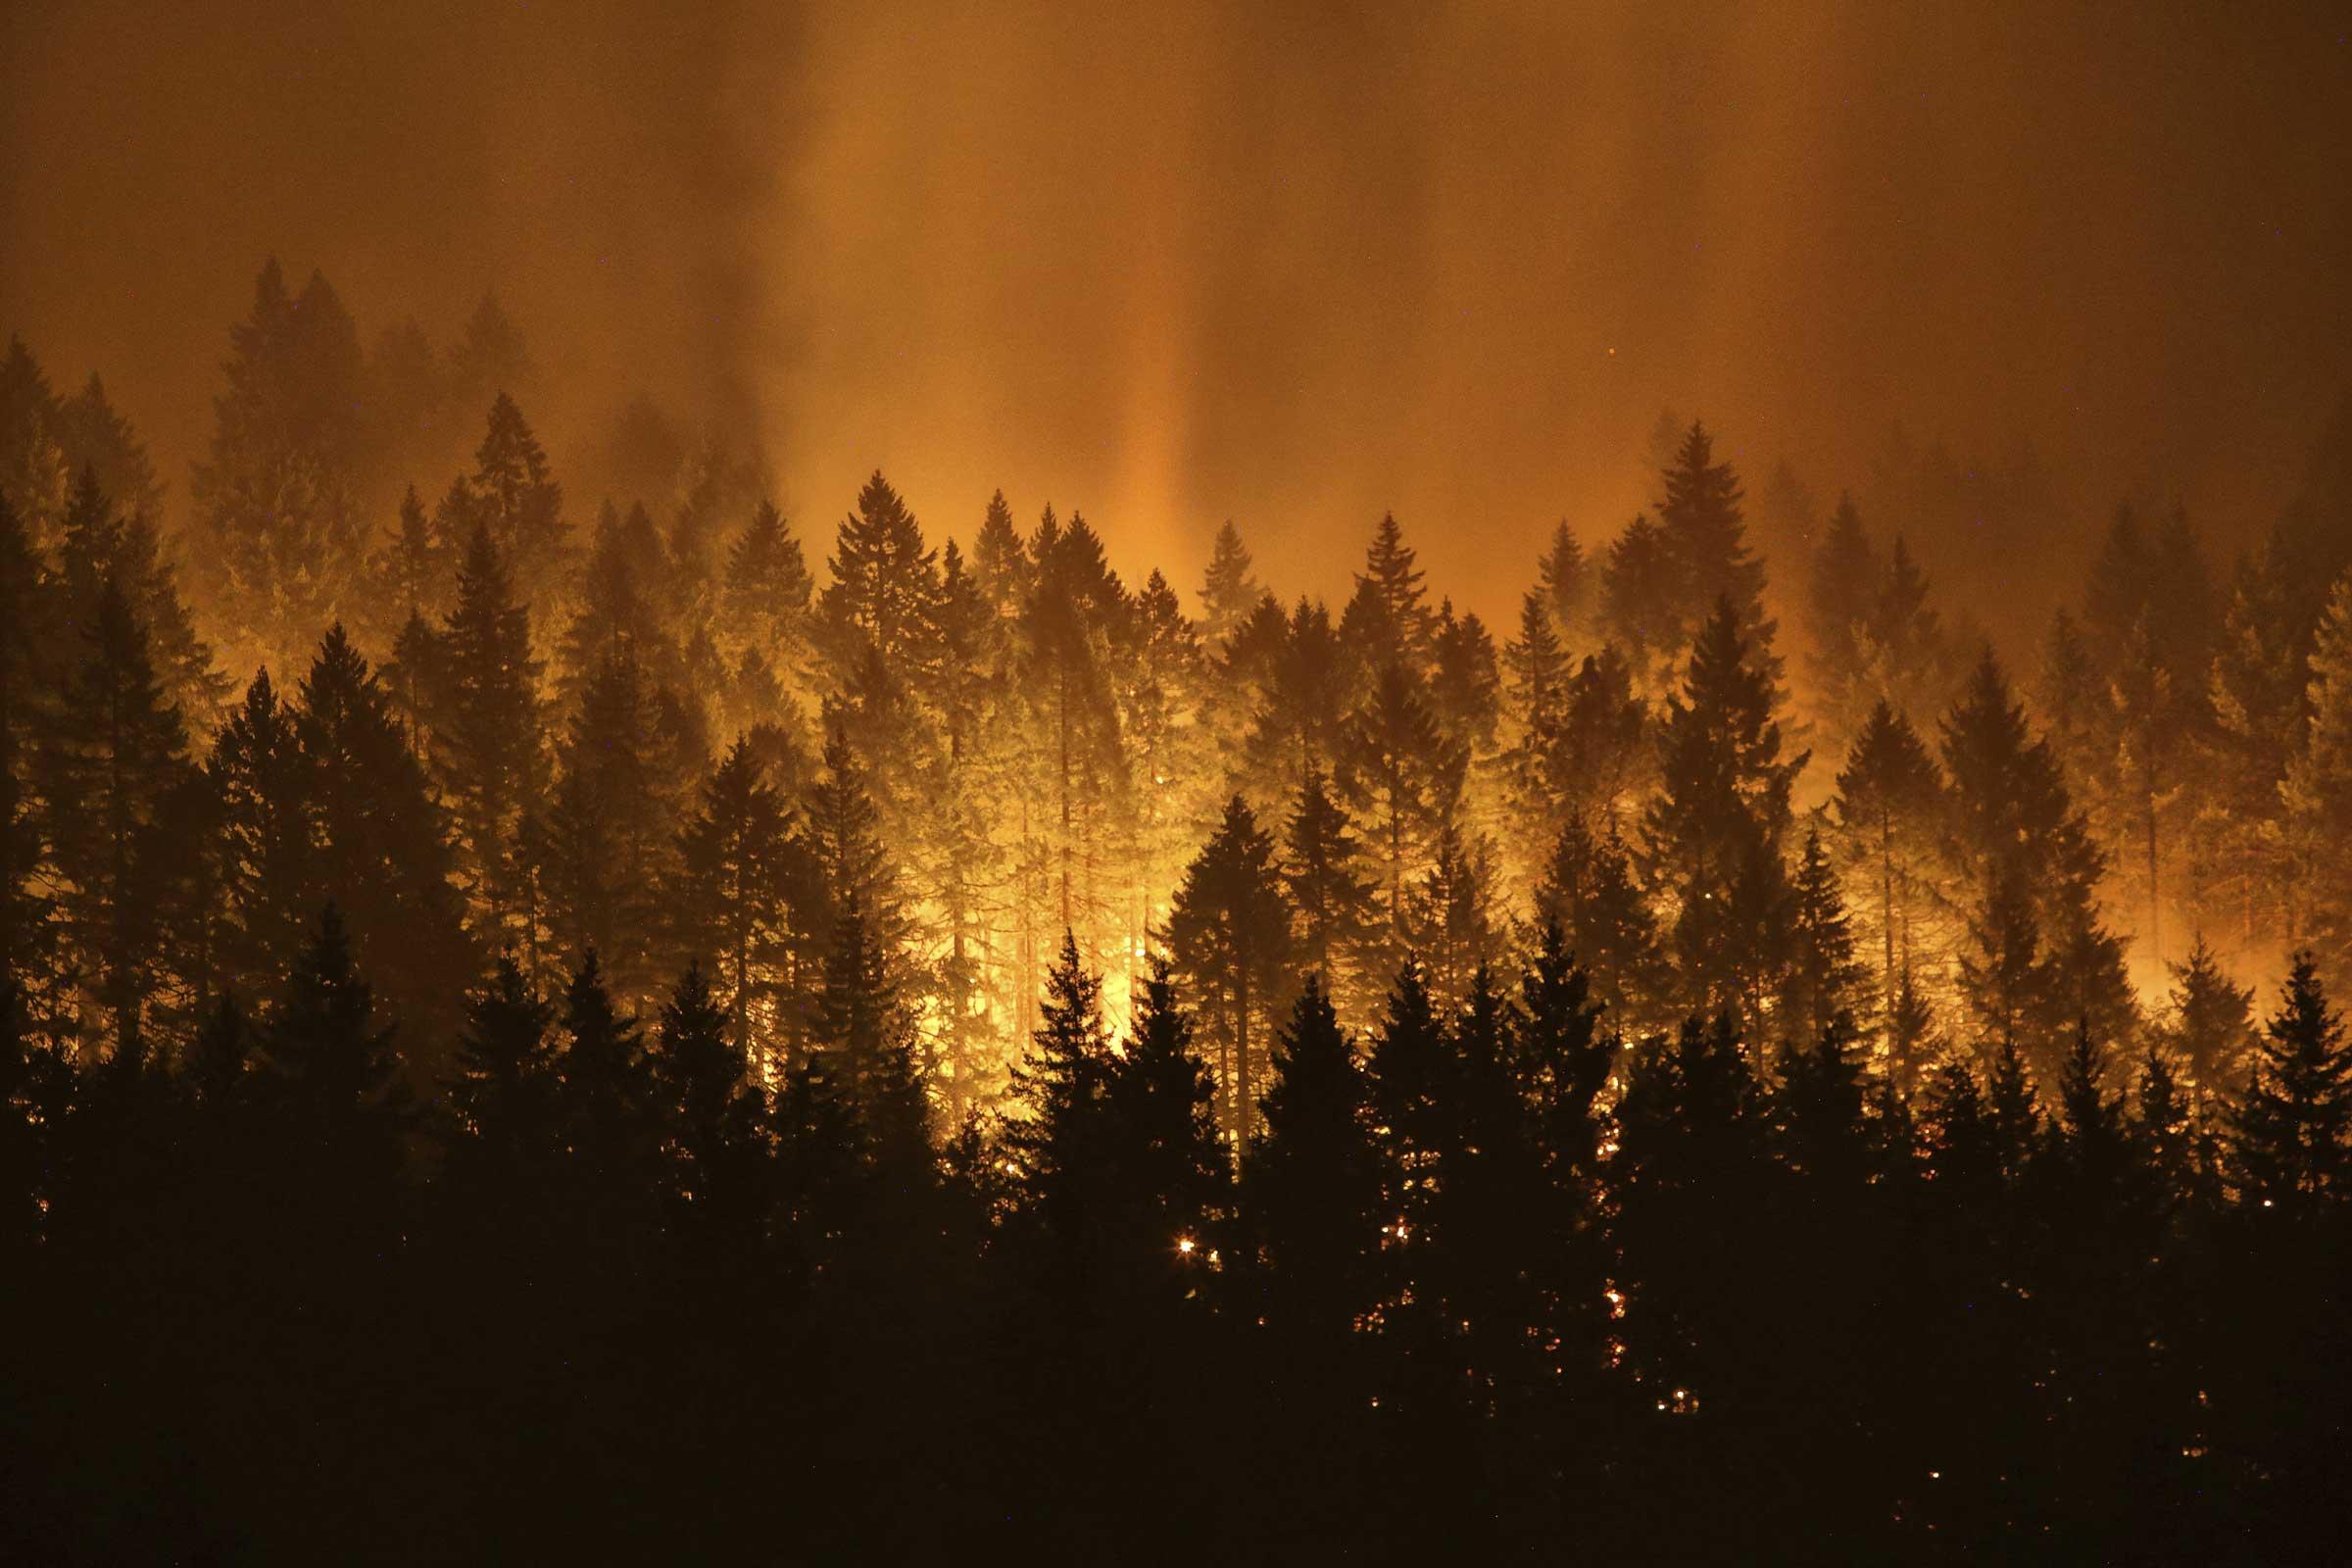 A wildfire tore through Oregon's Columbia River Gorge near Cascade Locks and Bridge of the Gods in early September. (Genna Martin/seattlepi.com via AP)